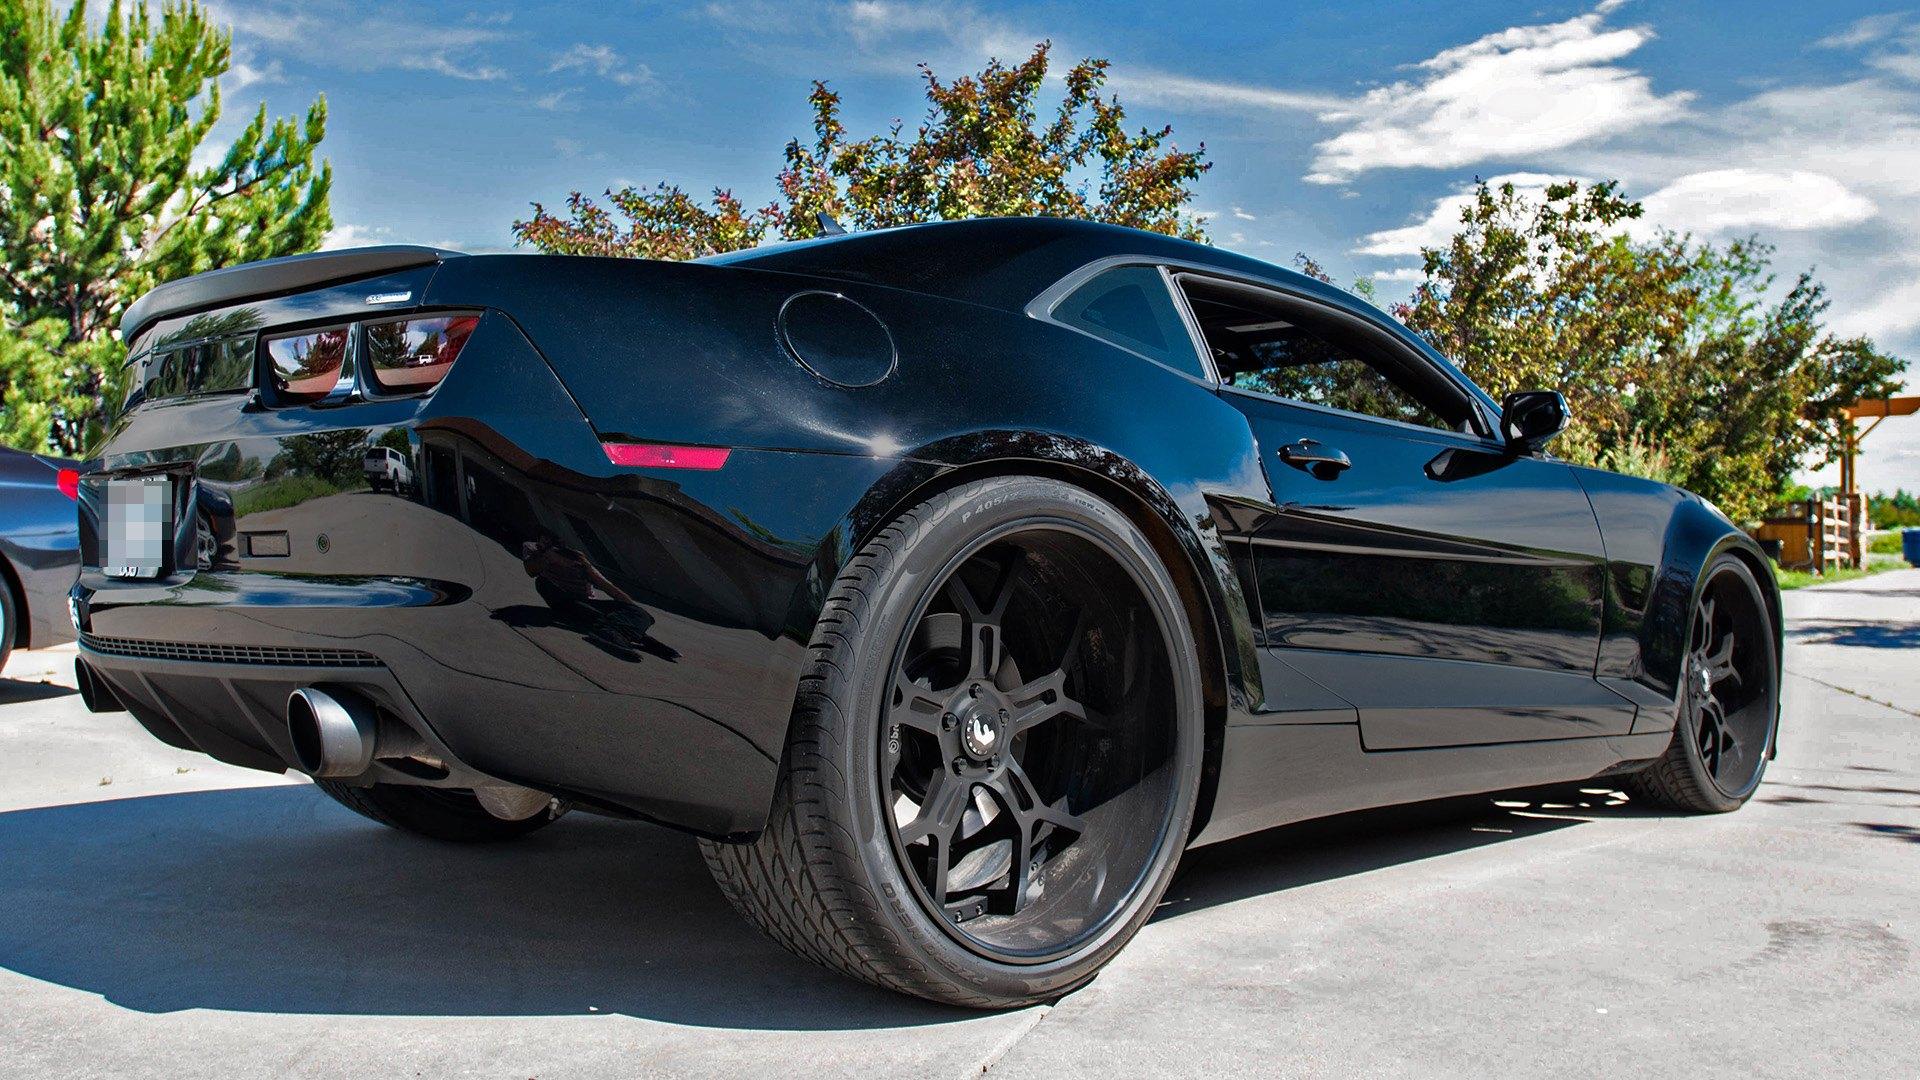 Batman Special Widebody Camaro On Forgiato Deep Dish Custom Wheels Carid Com Gallery